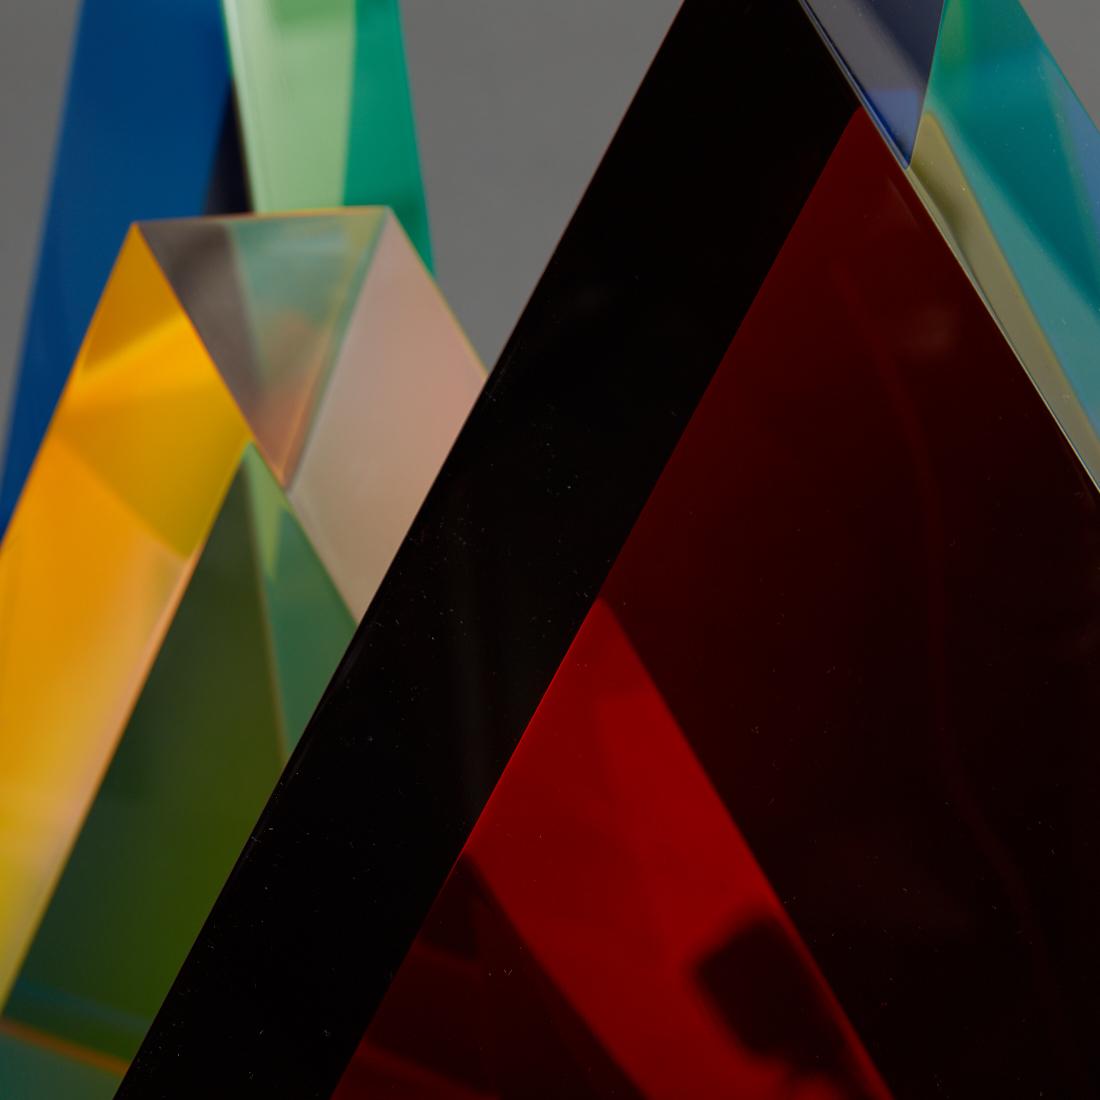 Lot 86 - Velizar Mihich VASA 3 Acrylic Triangles